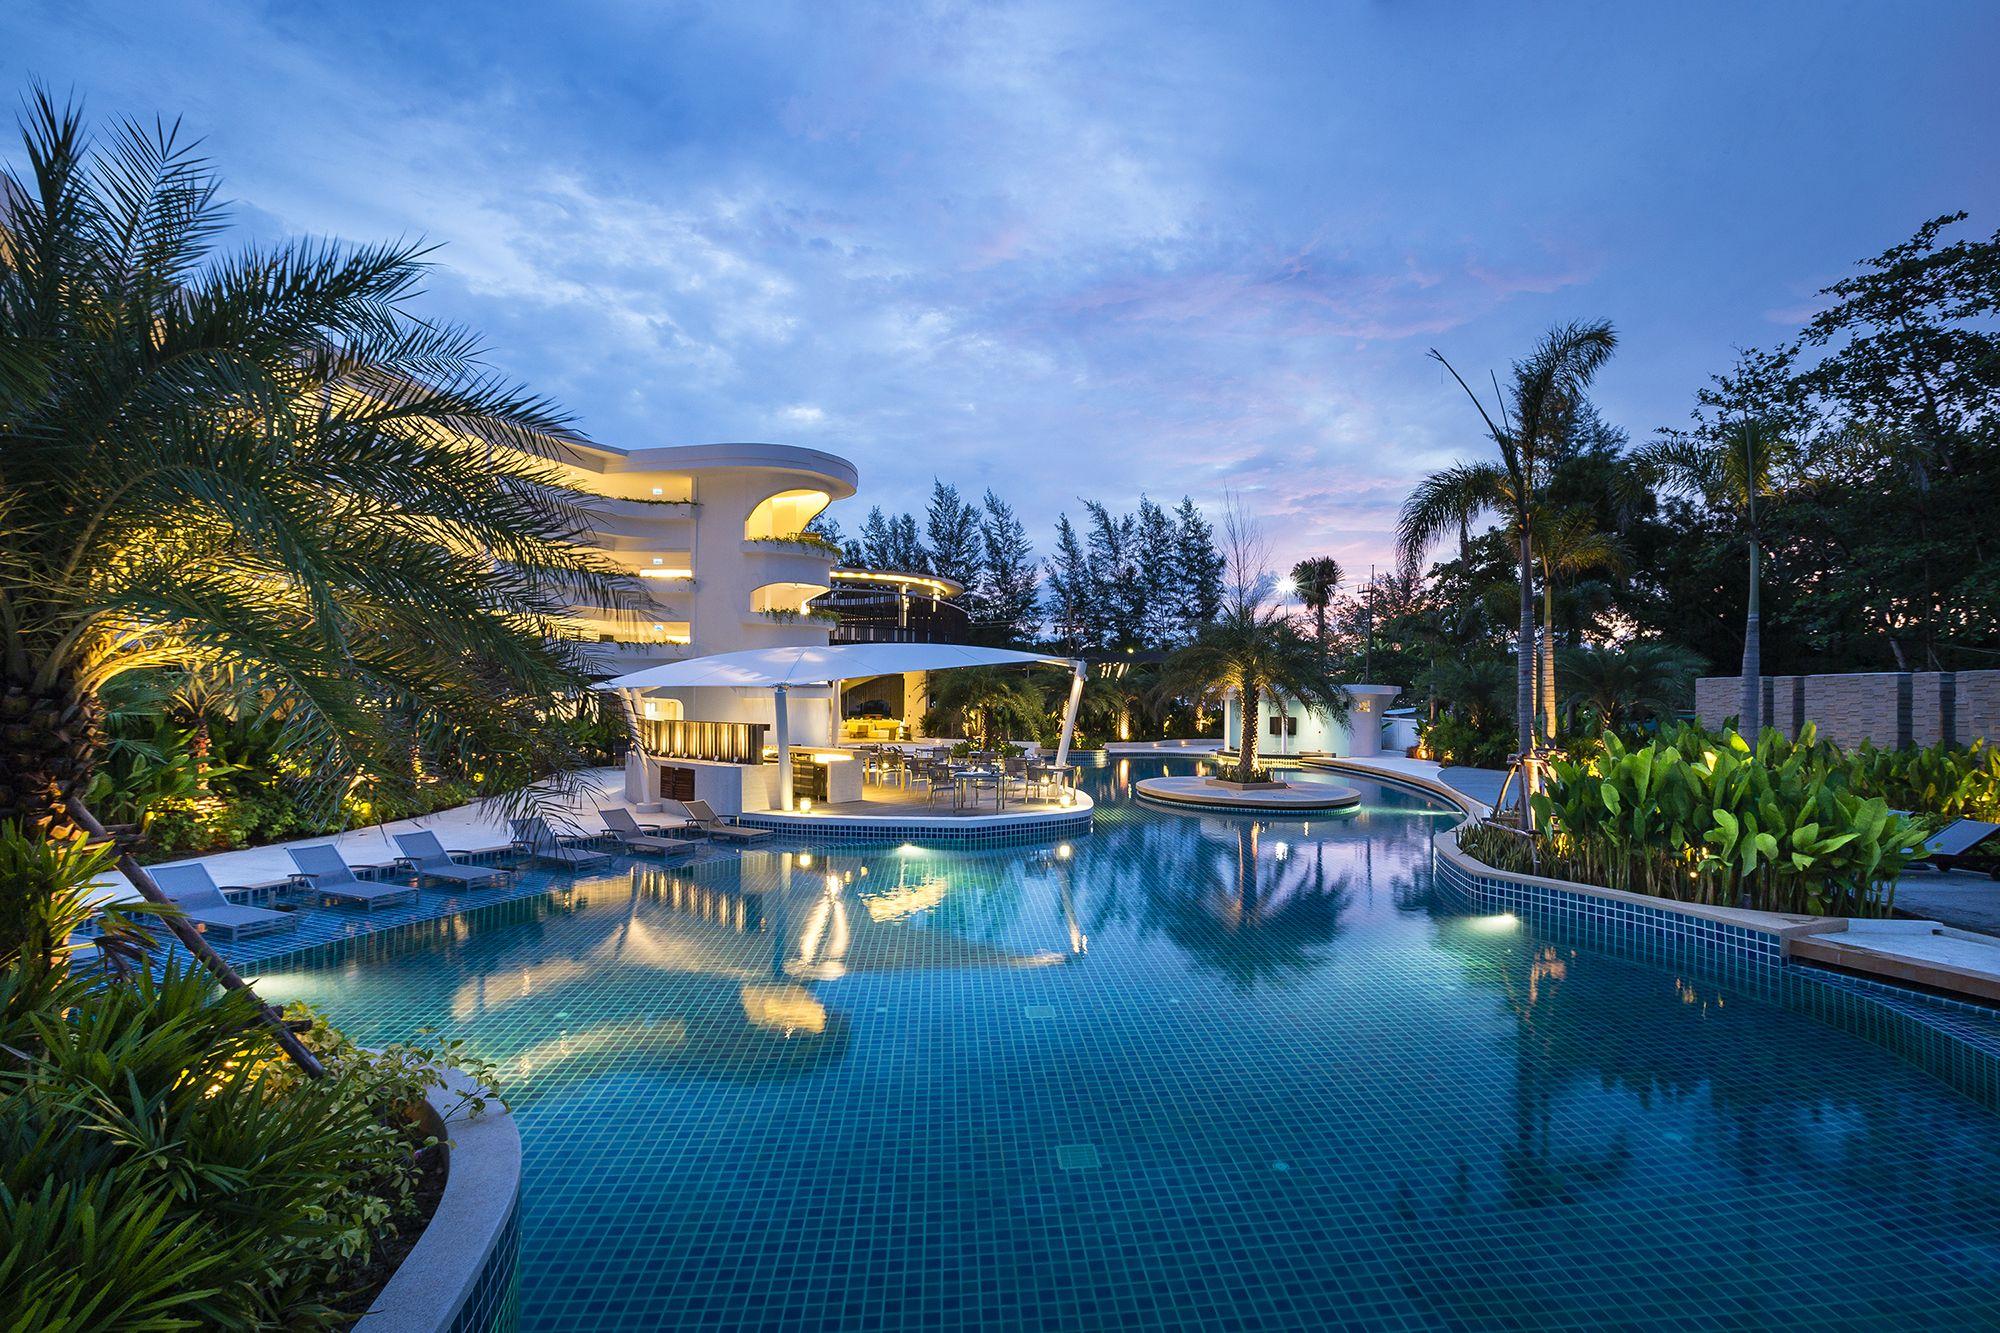 Sunsuri Hotel At Nai Harn Beach I Am Professional Photographer For Interior Hotel Resort Base In Phuket Thailand And Trave Karon Beach Phuket Resorts Phuket